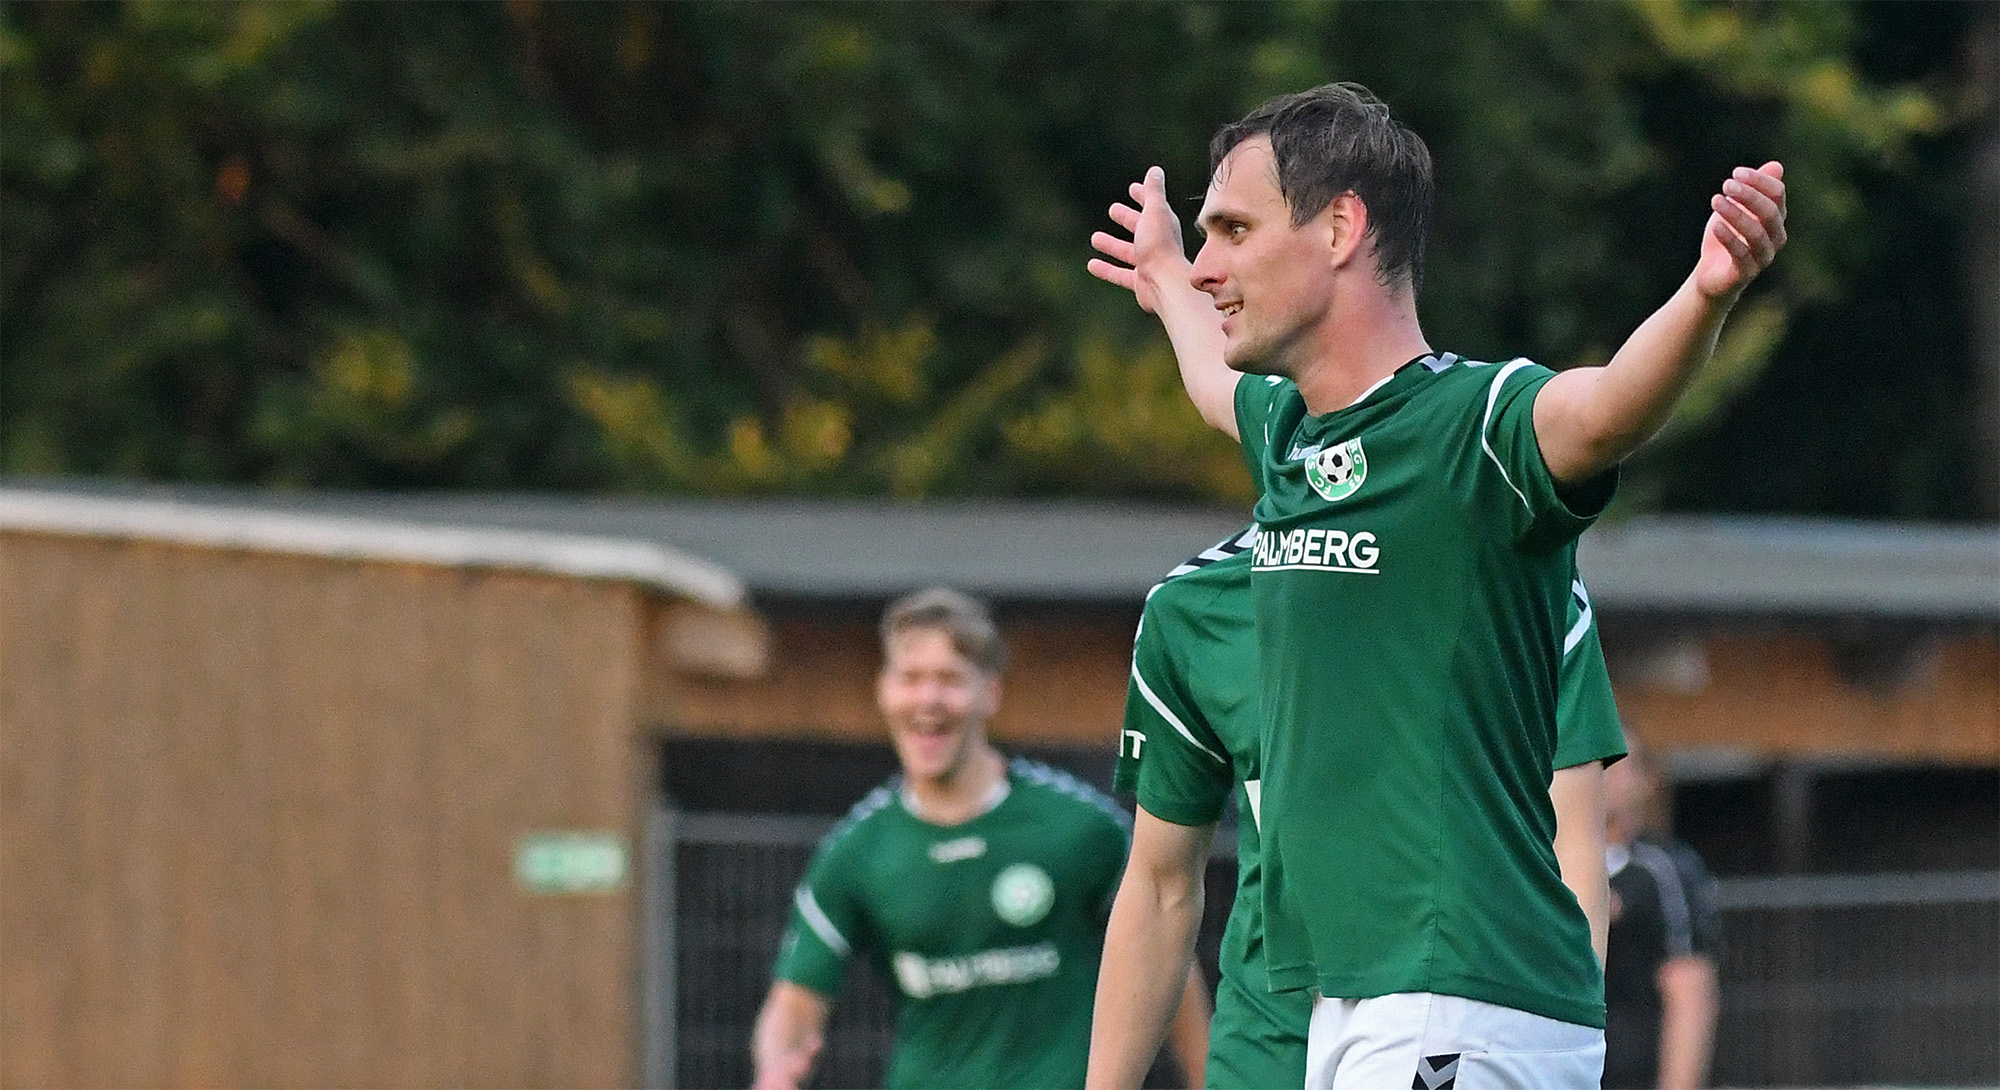 4-facher Torschütze im Spiel gegen die SpVgg Cambs-Leezen Traktor: Hannes Komoss!